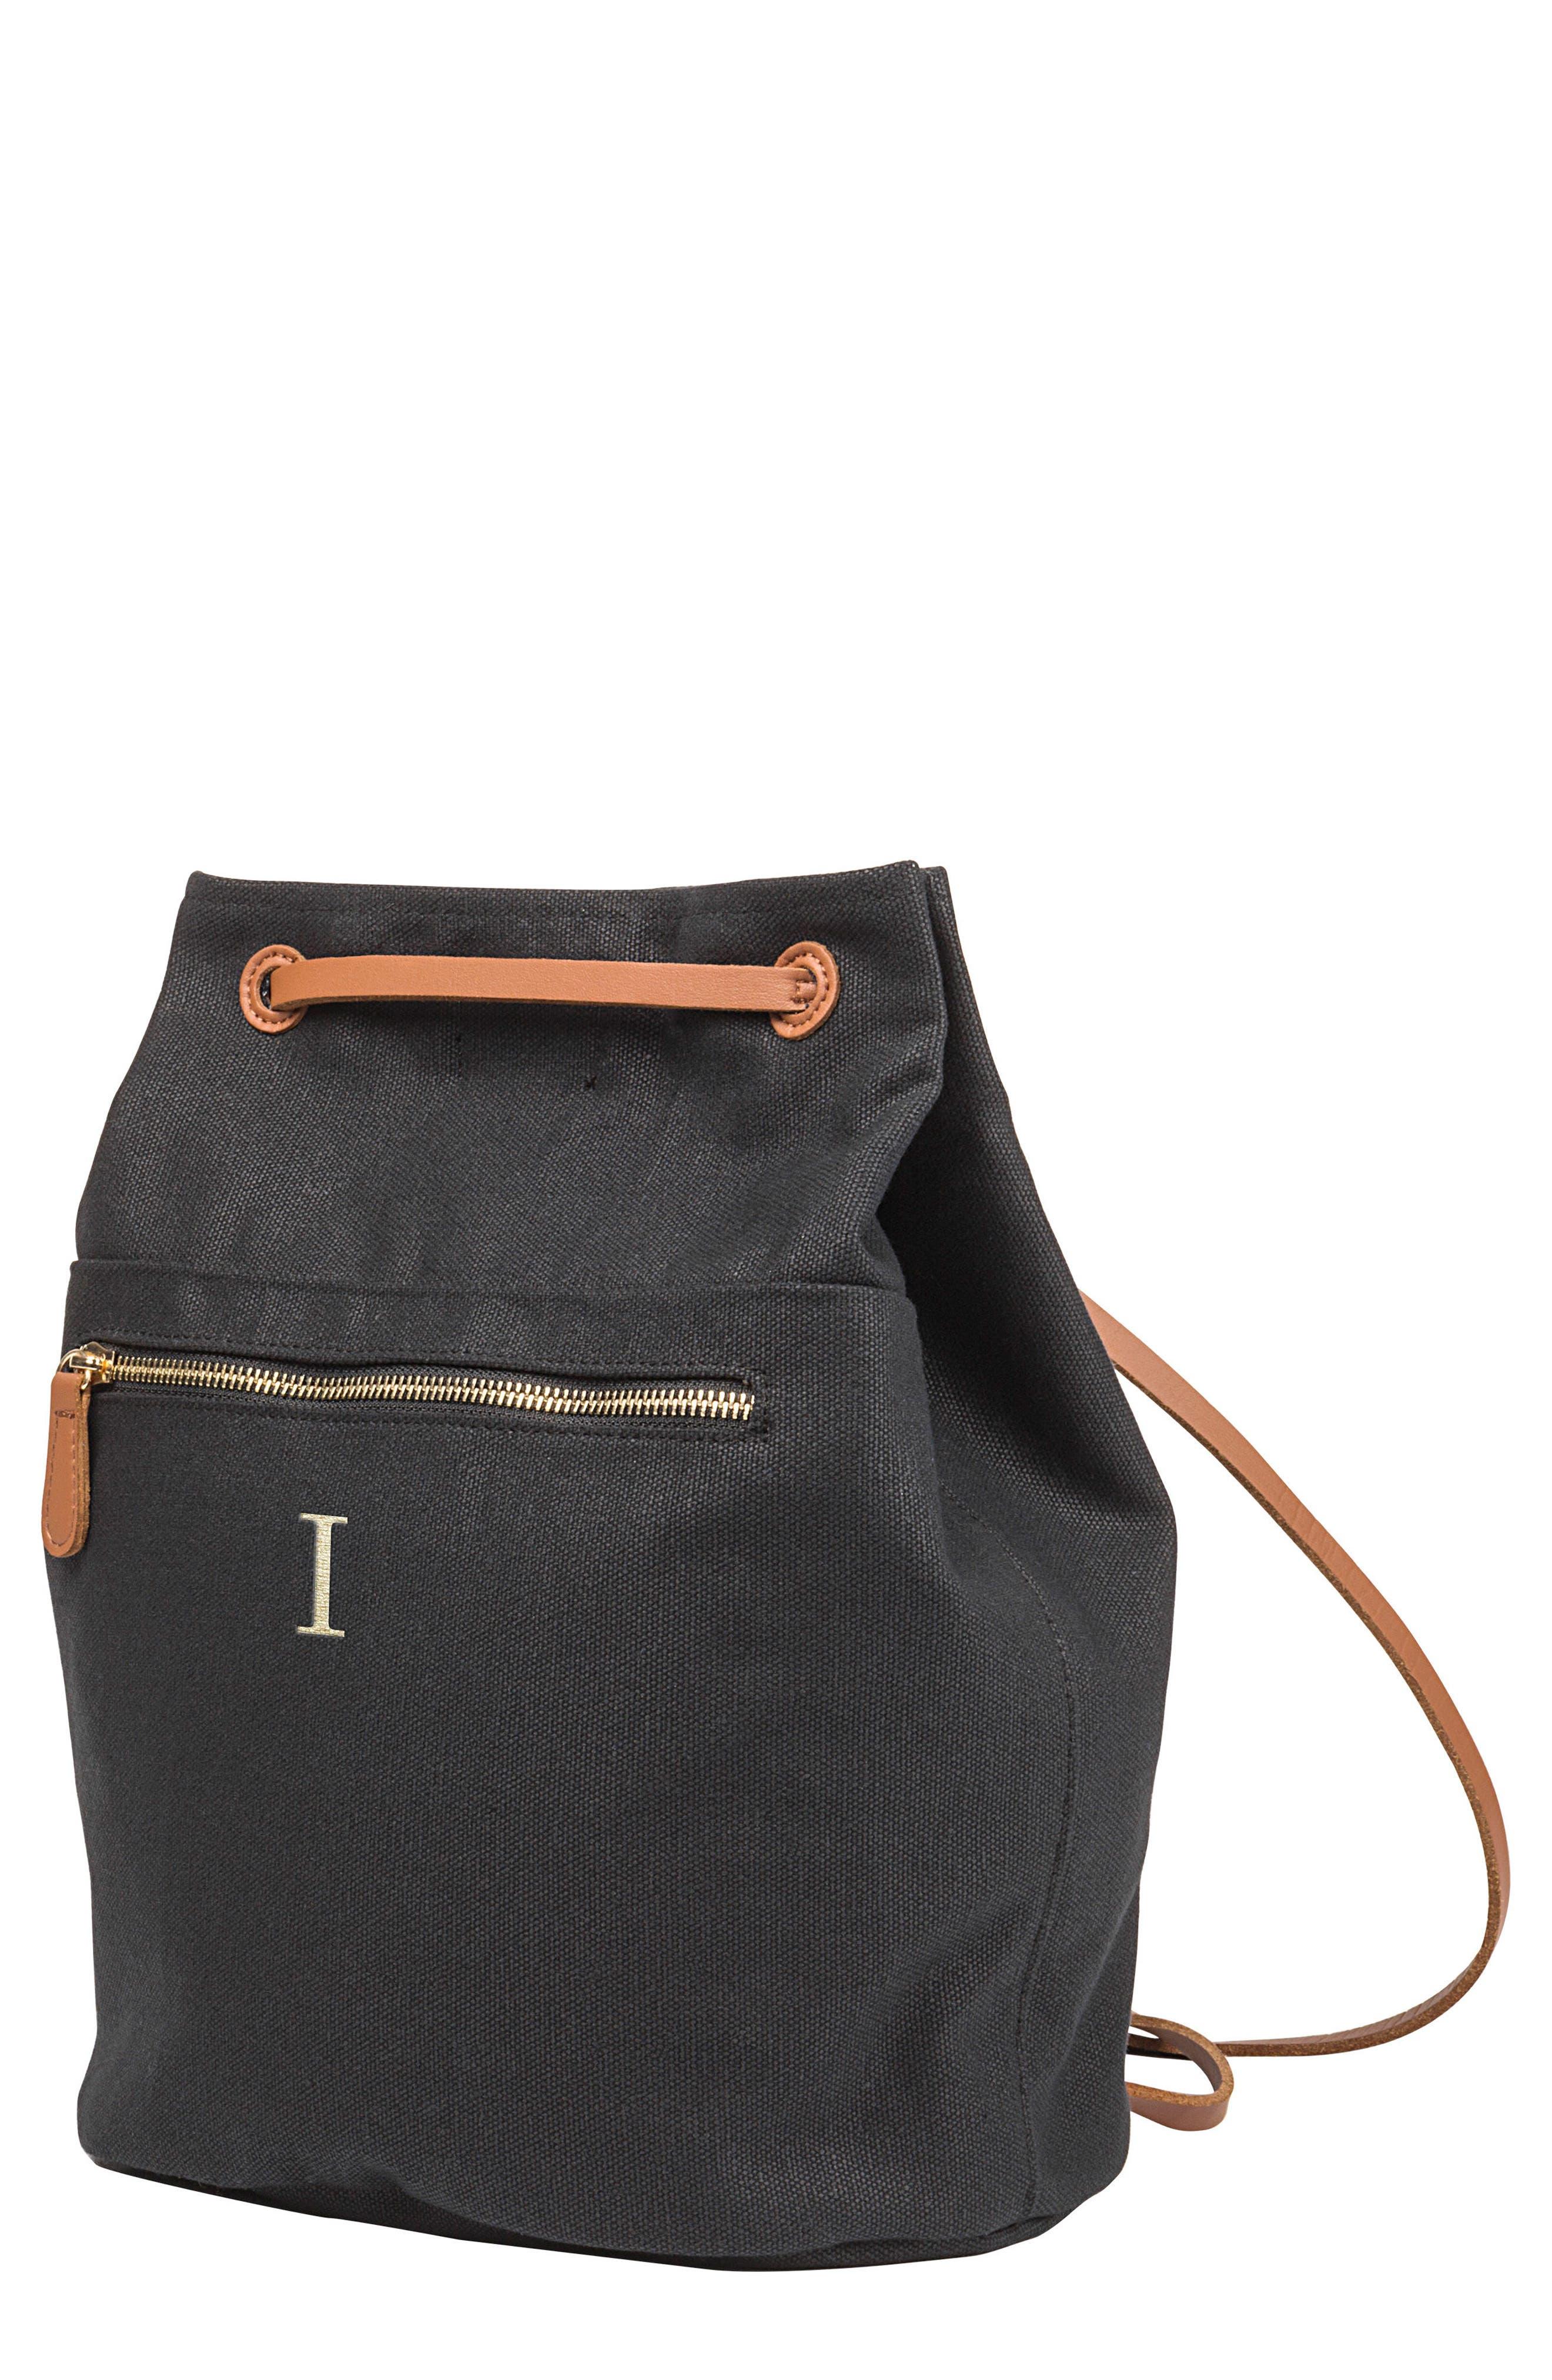 Monogram Convertible Backpack,                             Main thumbnail 10, color,